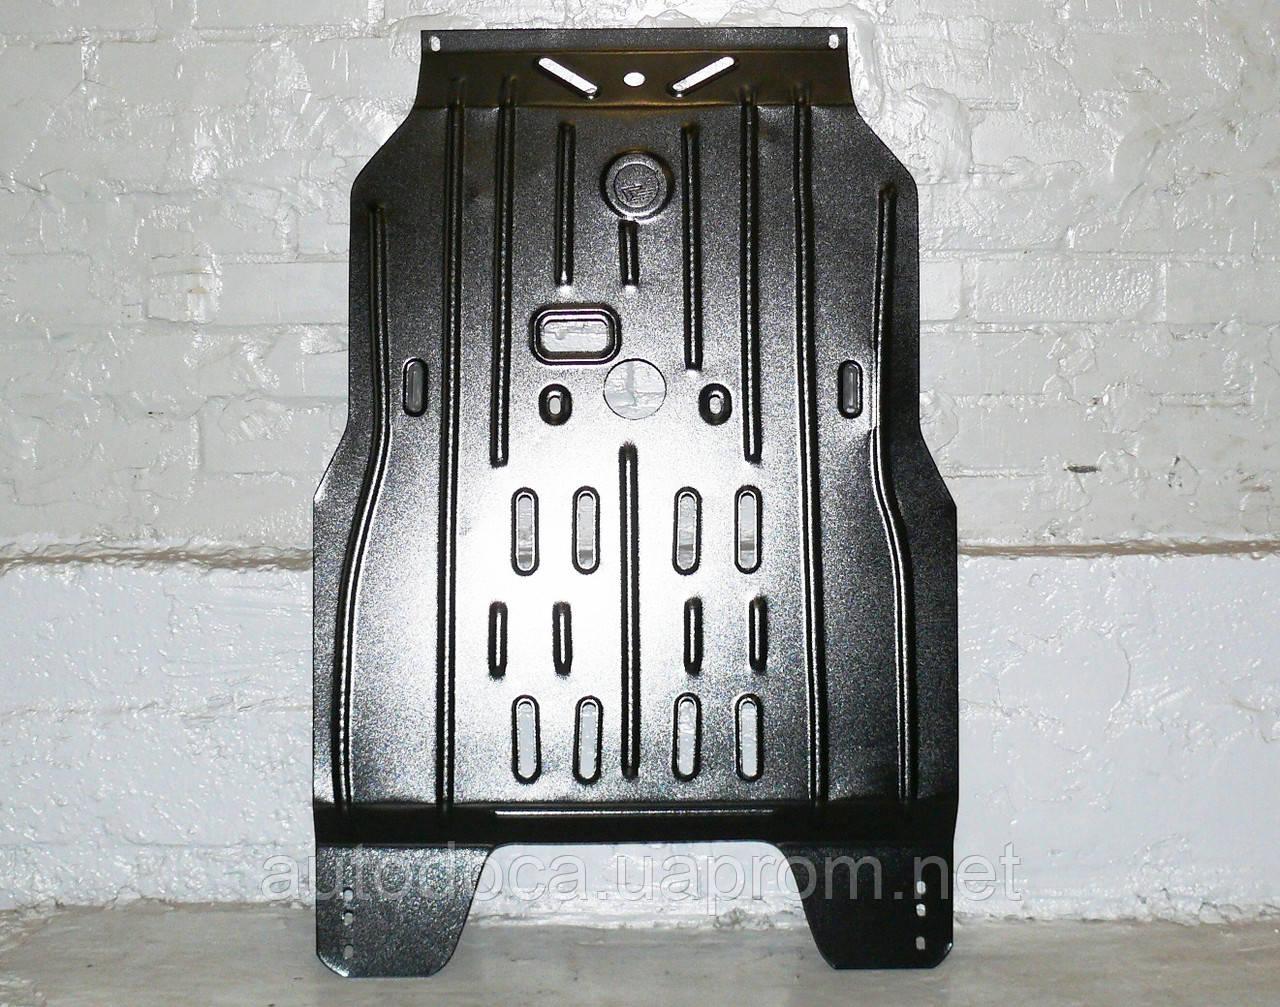 Защита картера двигателя и кпп Mitsubishi Pajero Wagon 1999-